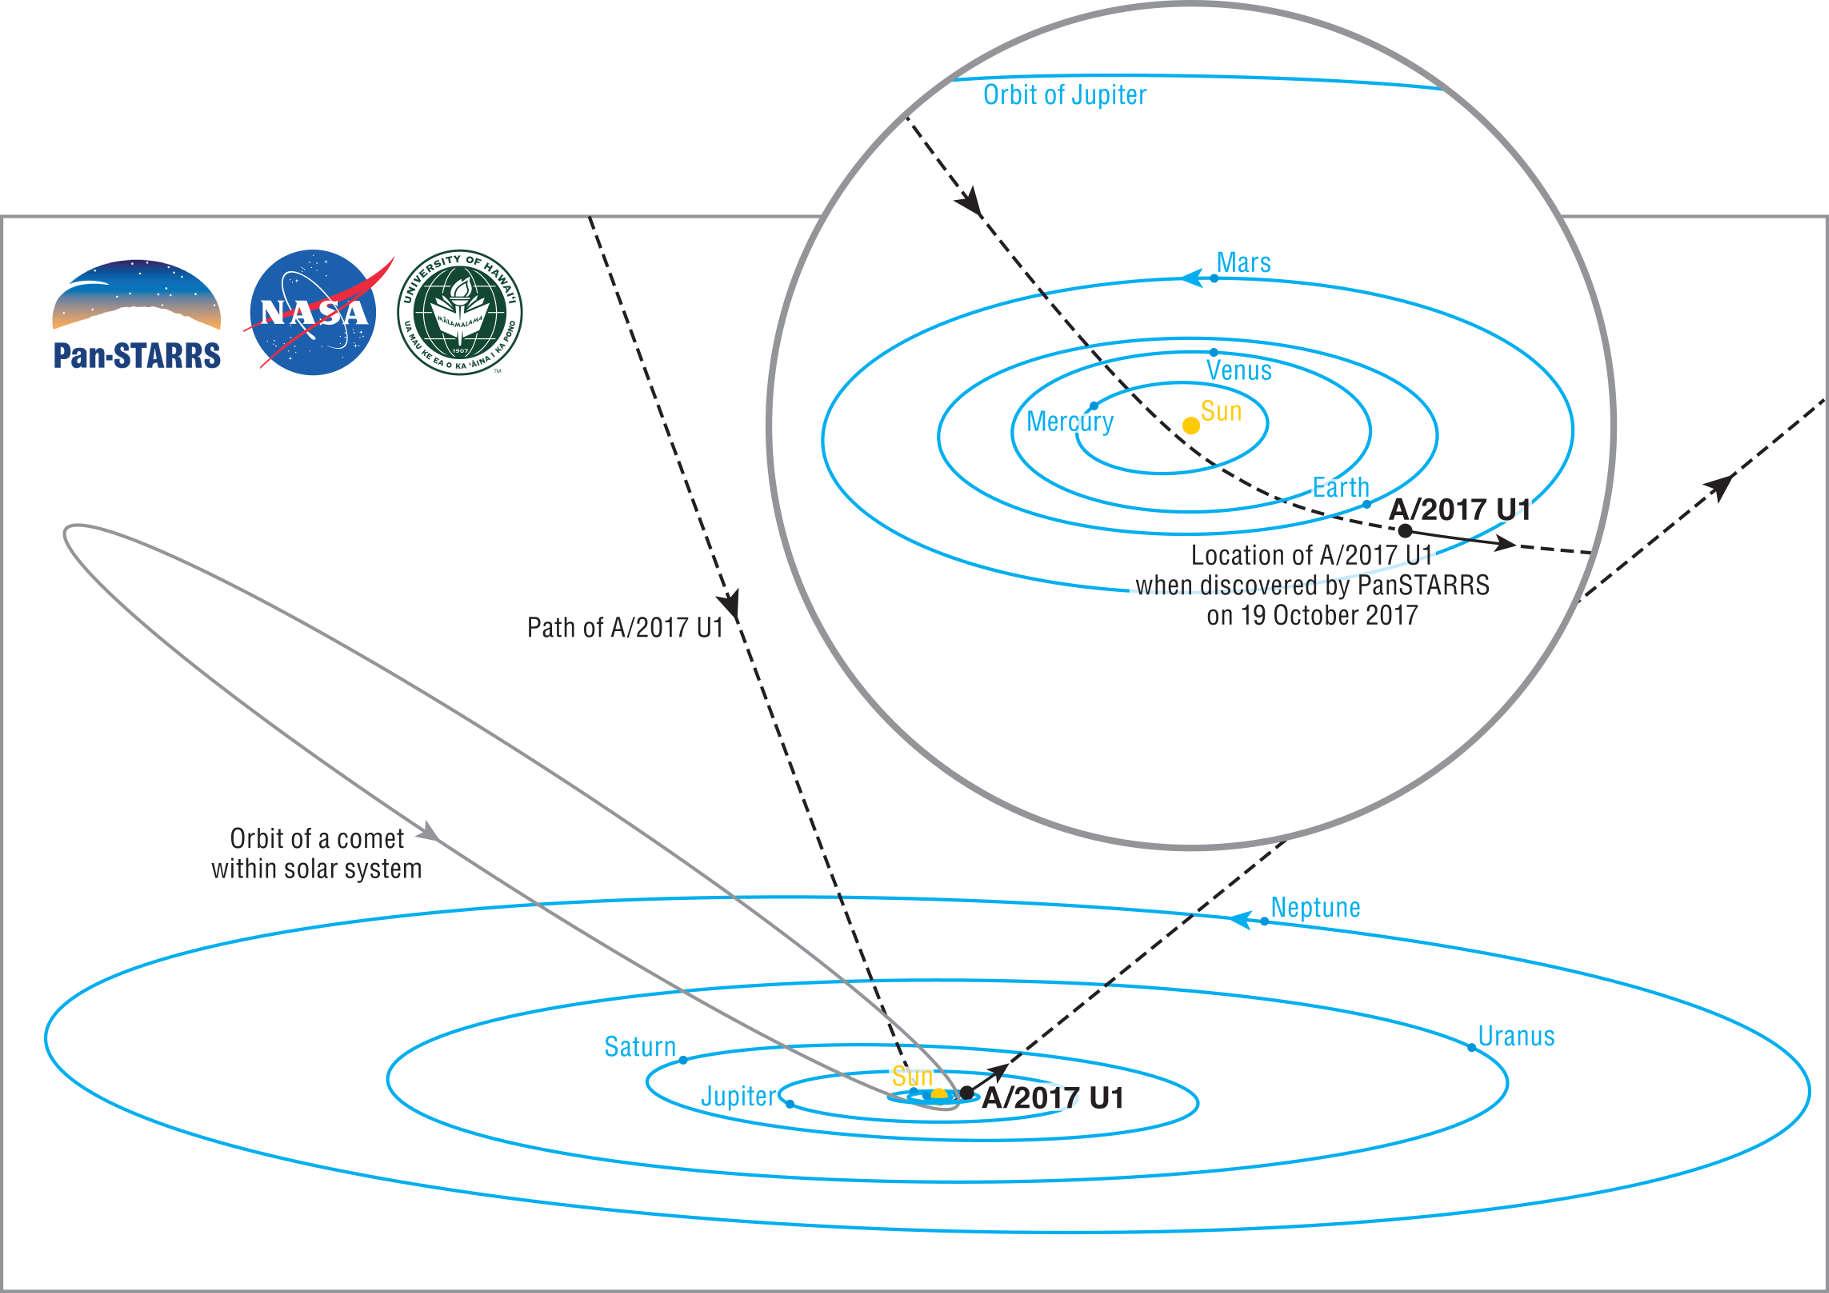 The orbit of interstellar object Oumuamua